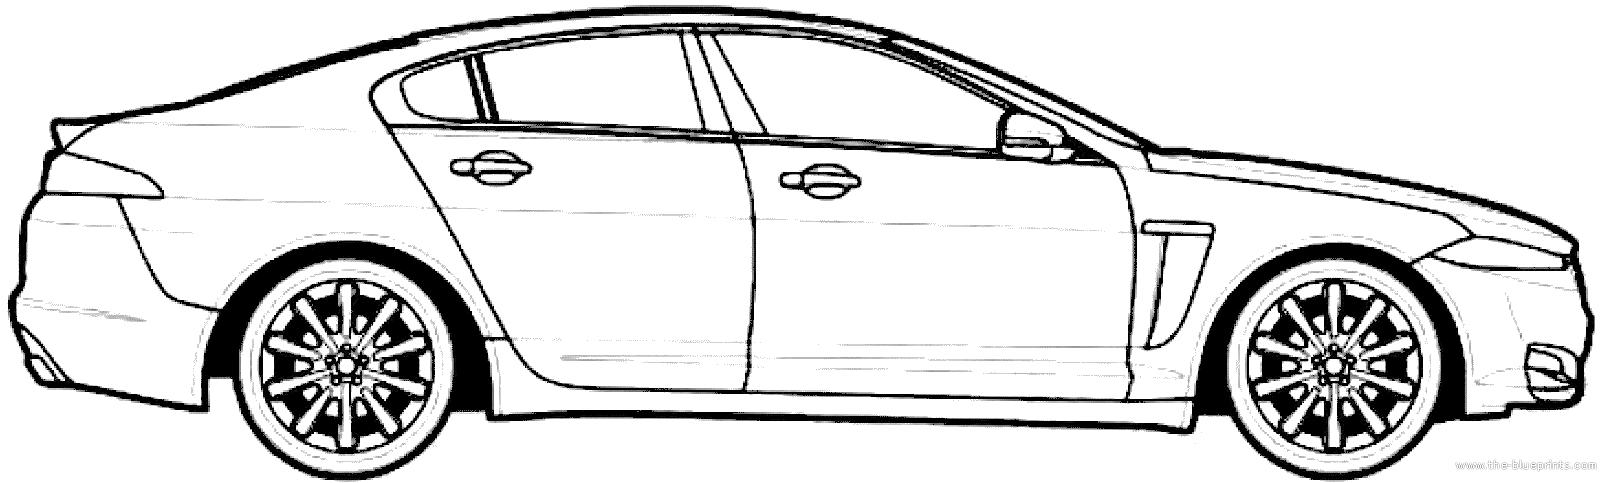 jaguar car drawing - photo #4